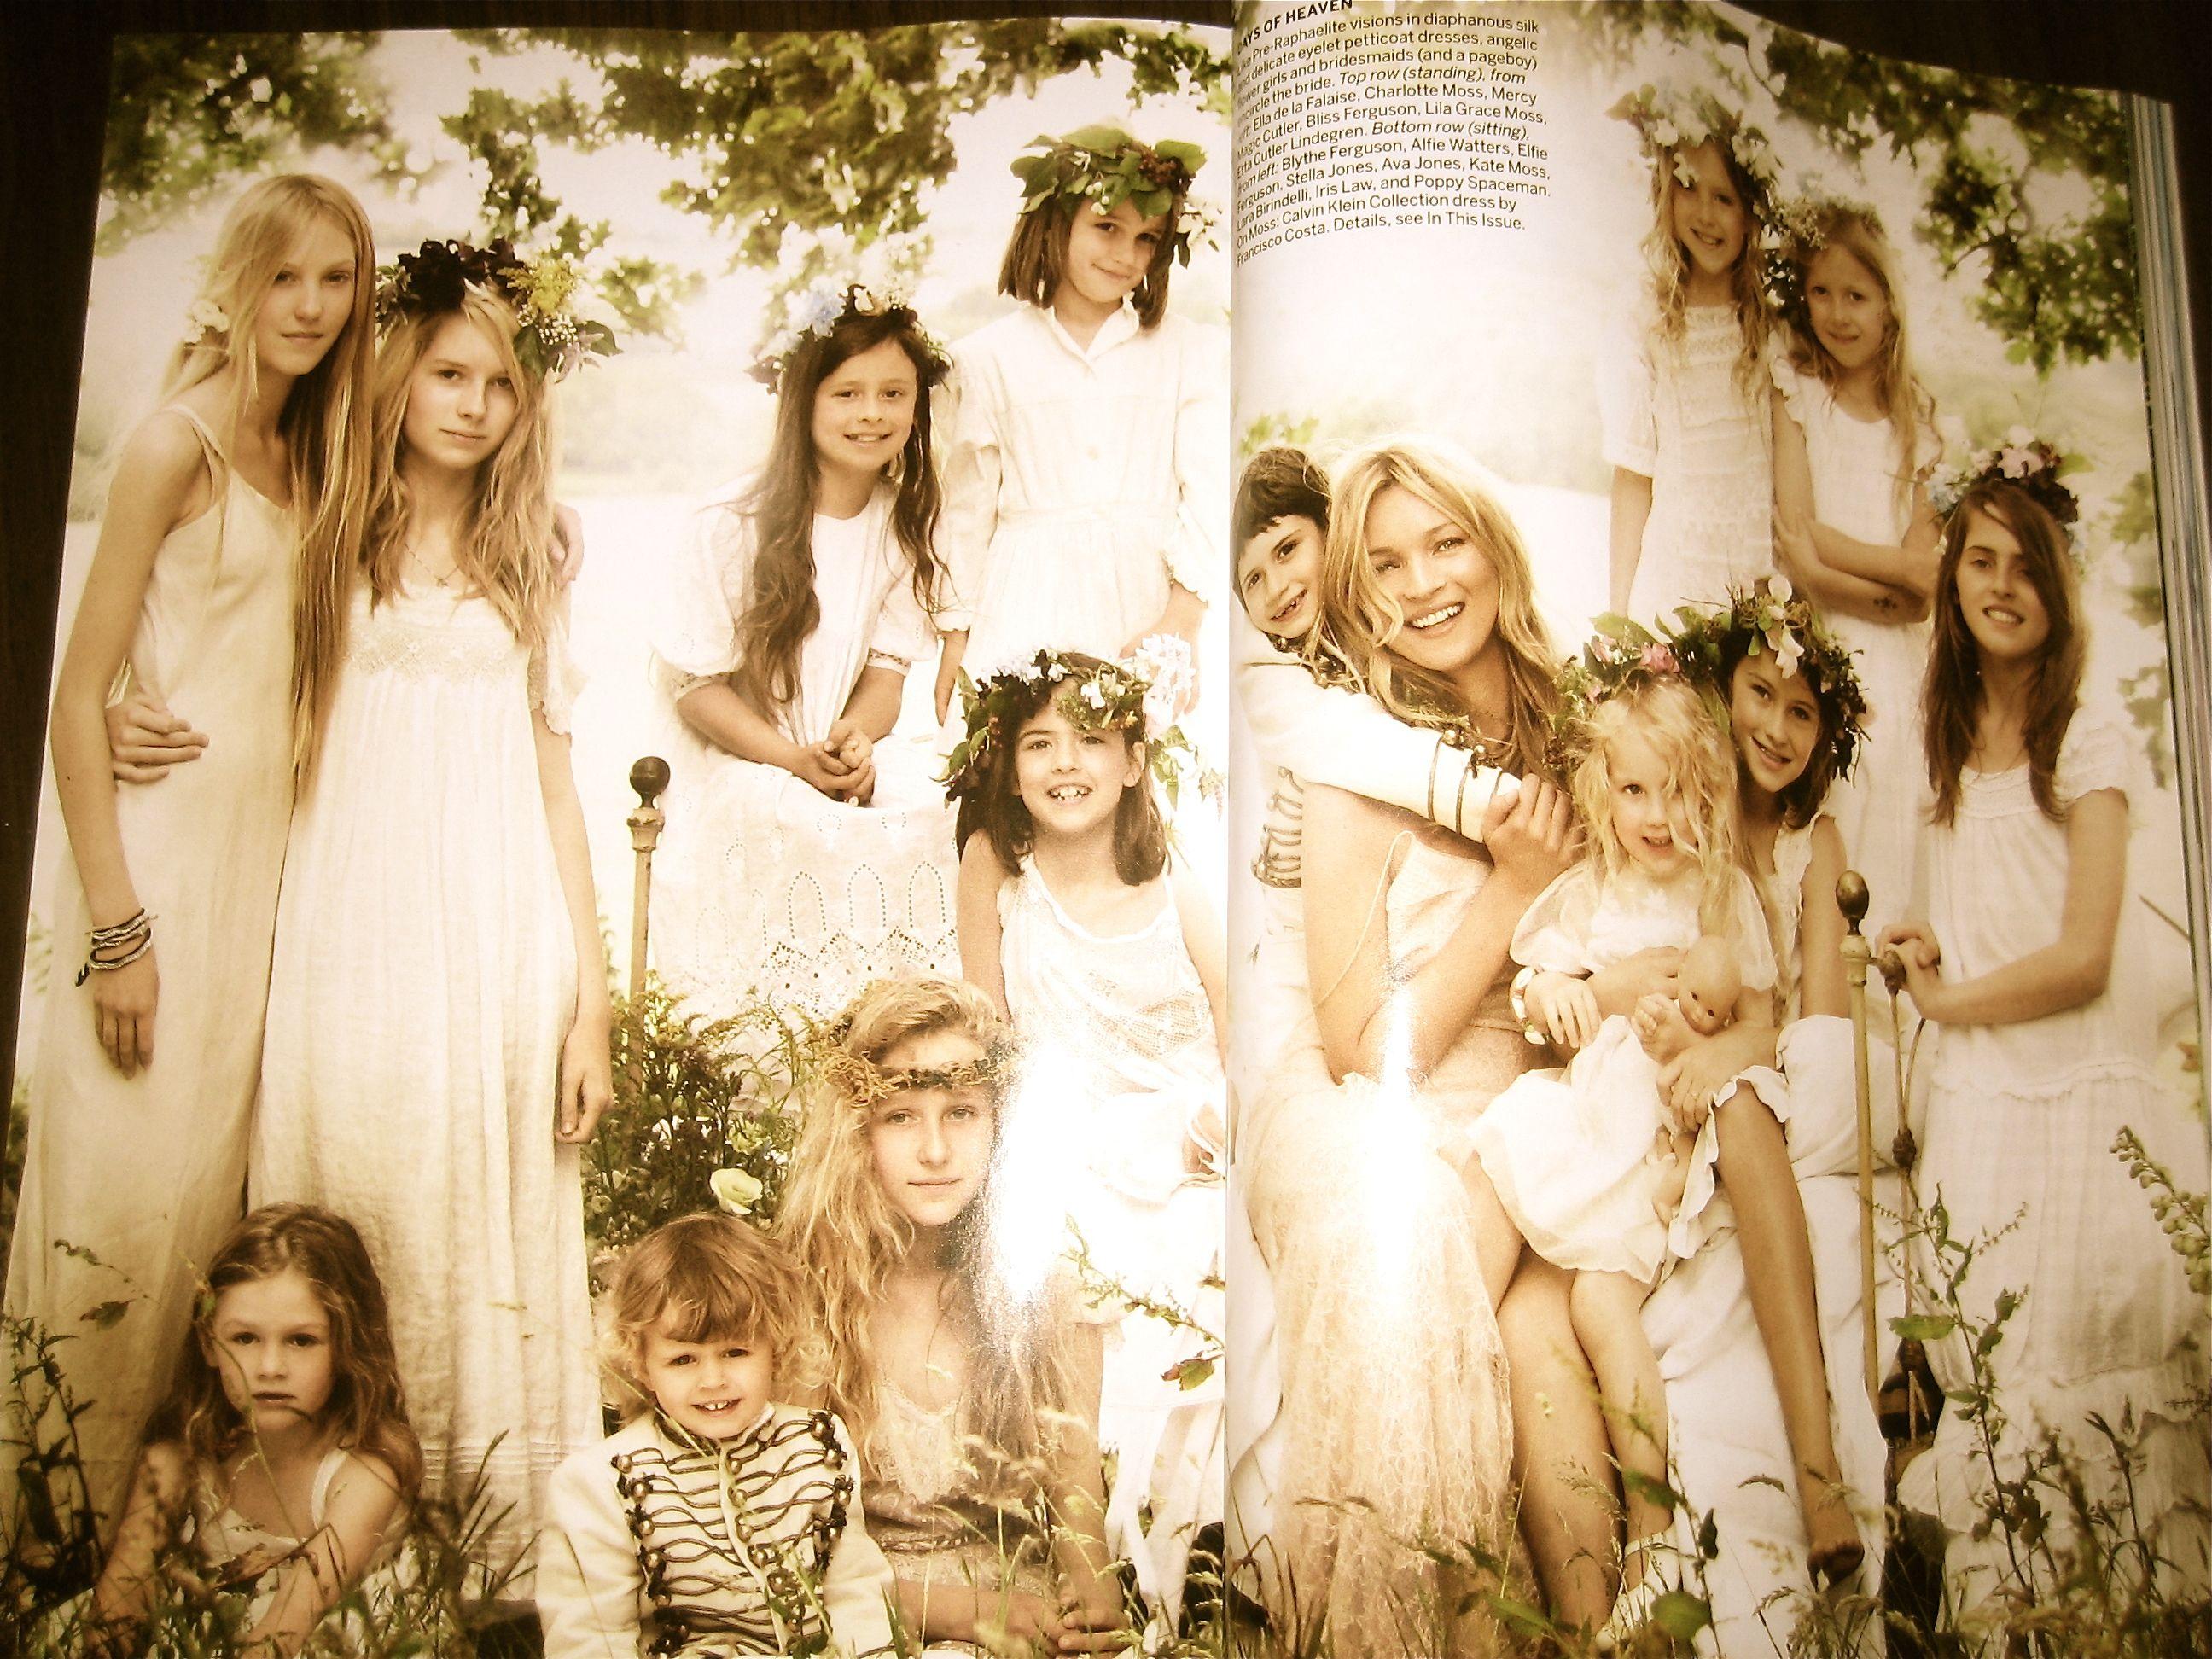 Kate Moss Wedding - Vogue Wedding Guide